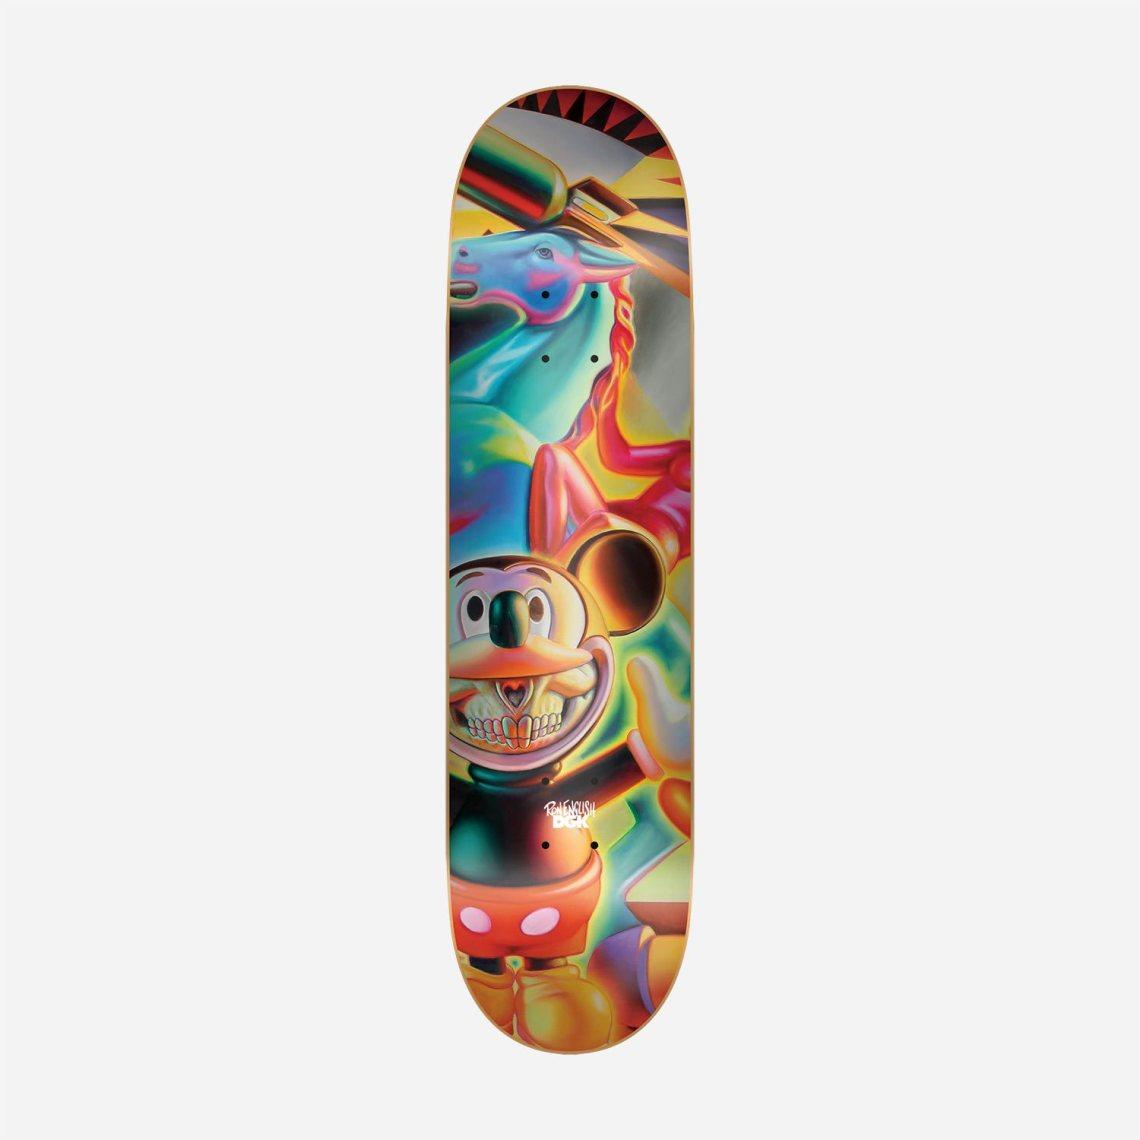 Ron English Dgk Skateboards Series 5